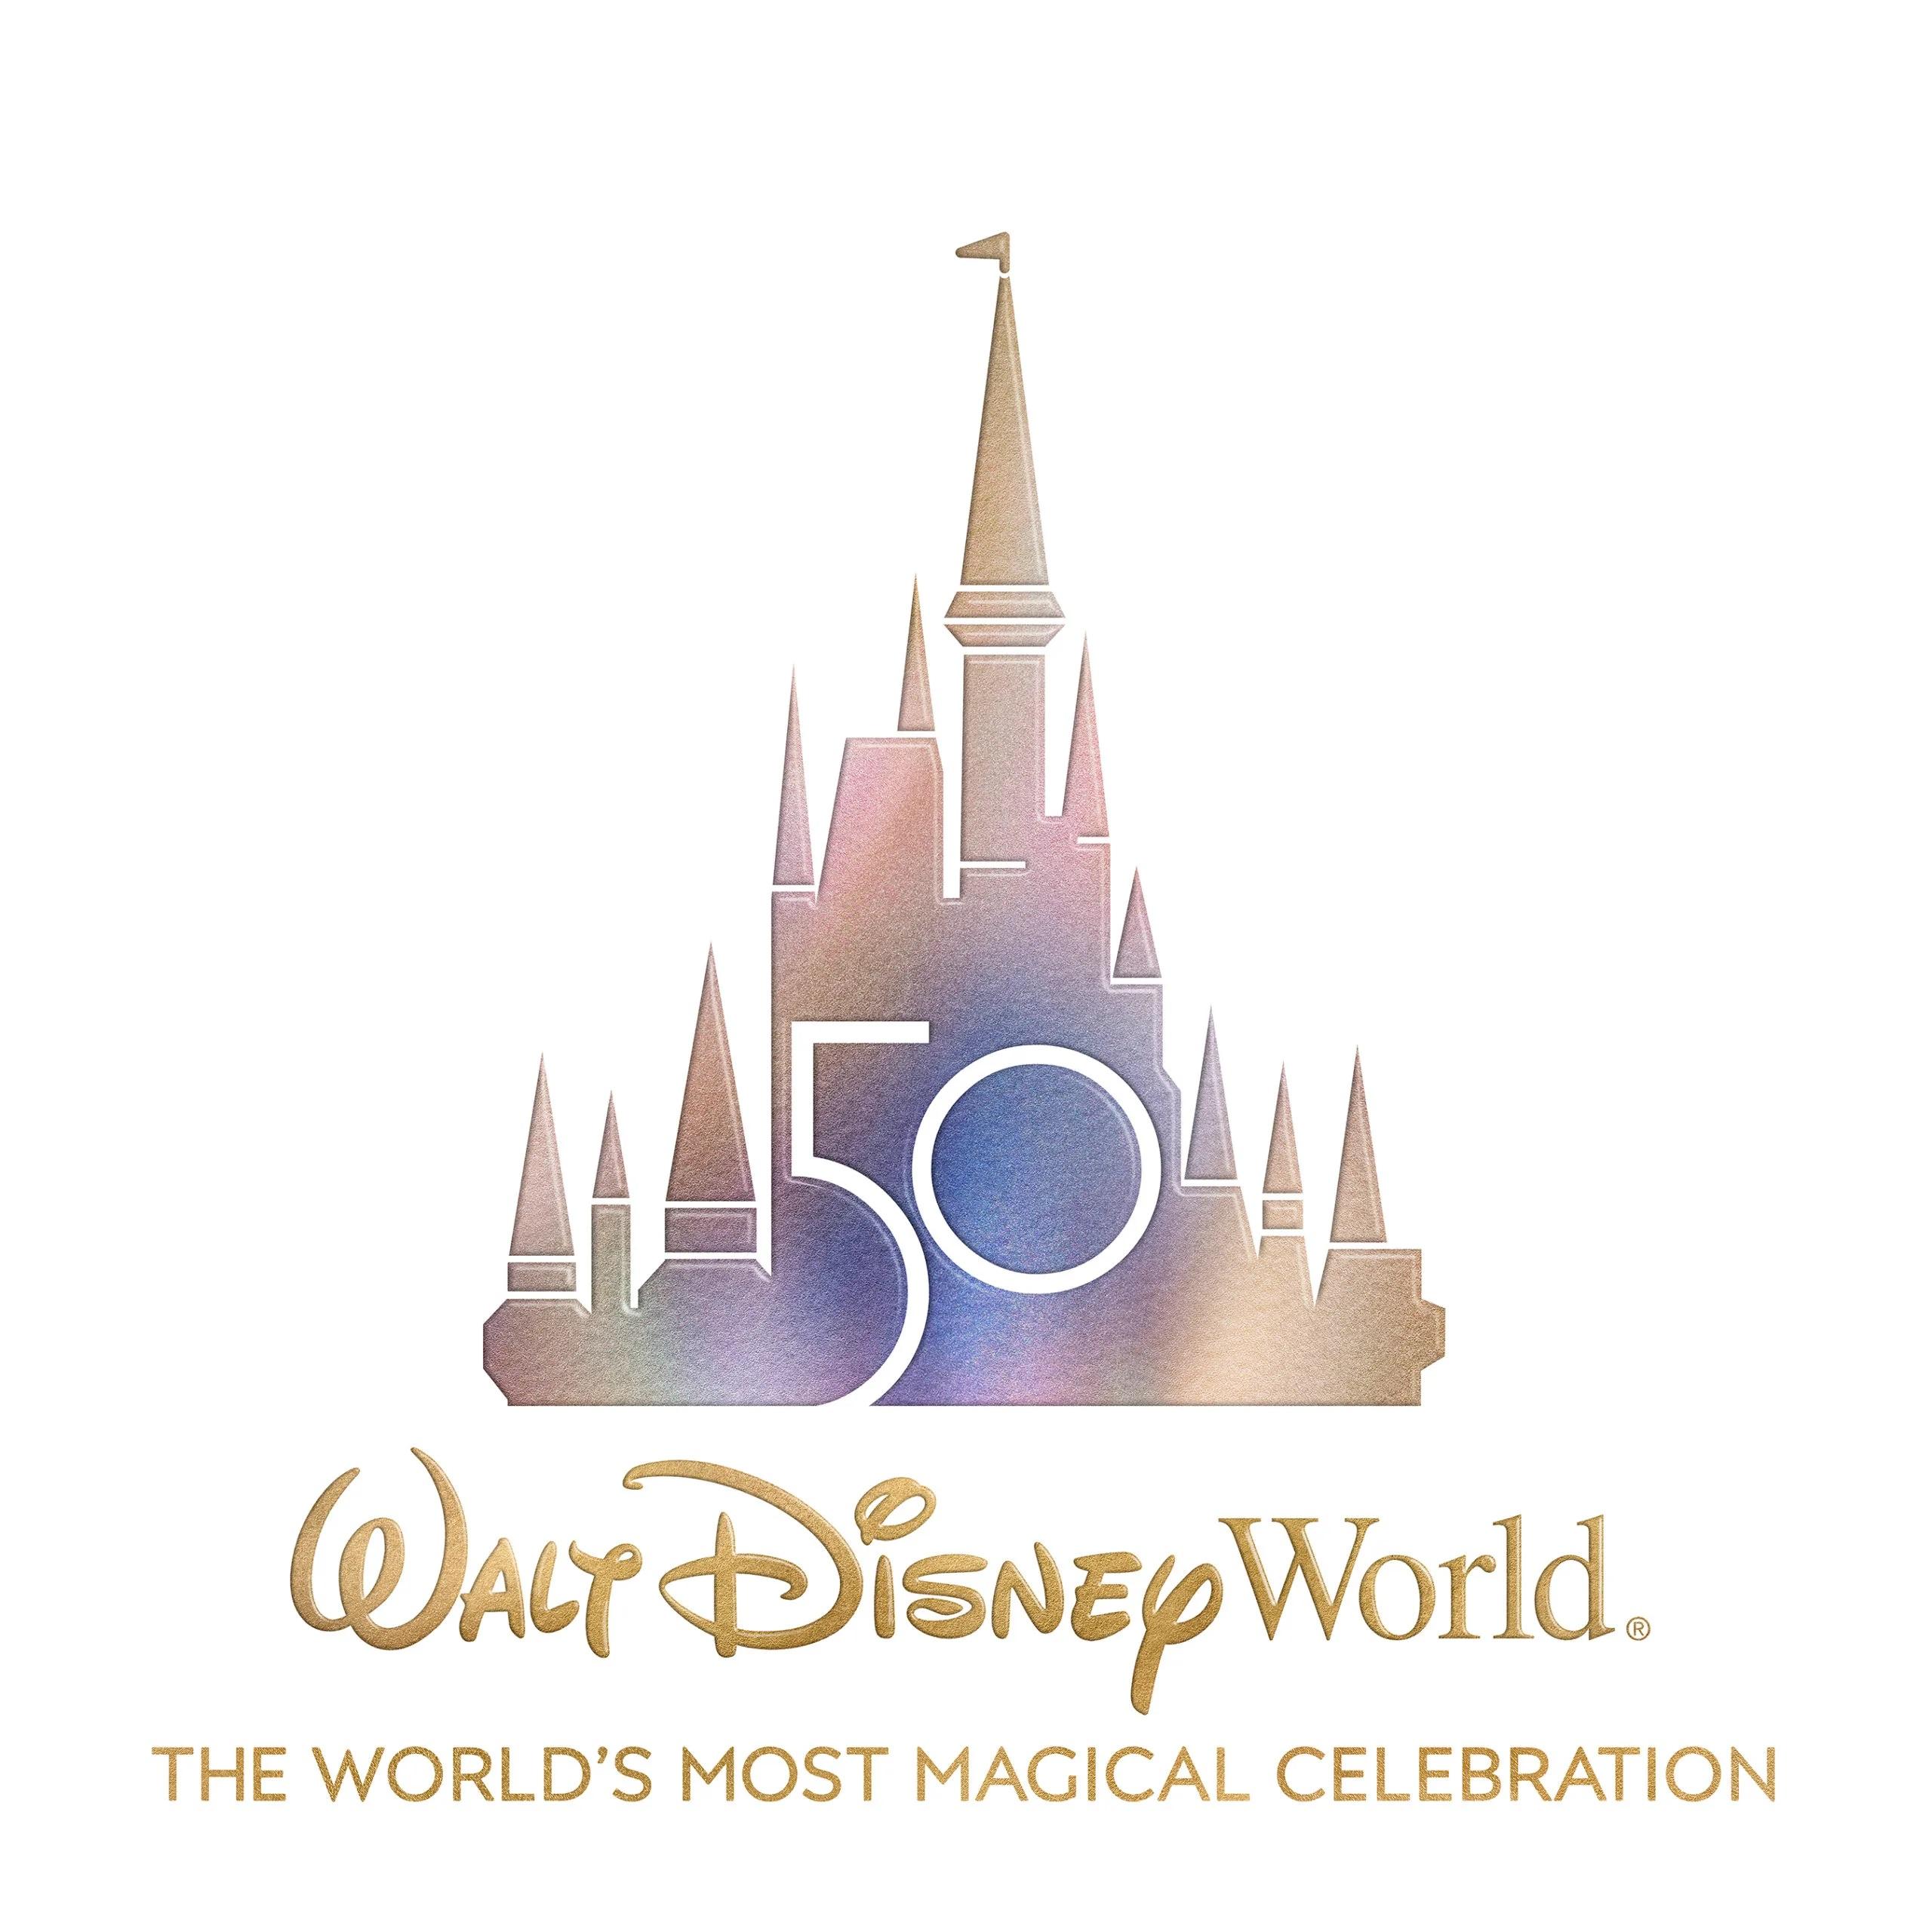 walt disney world 50 aniversario logo